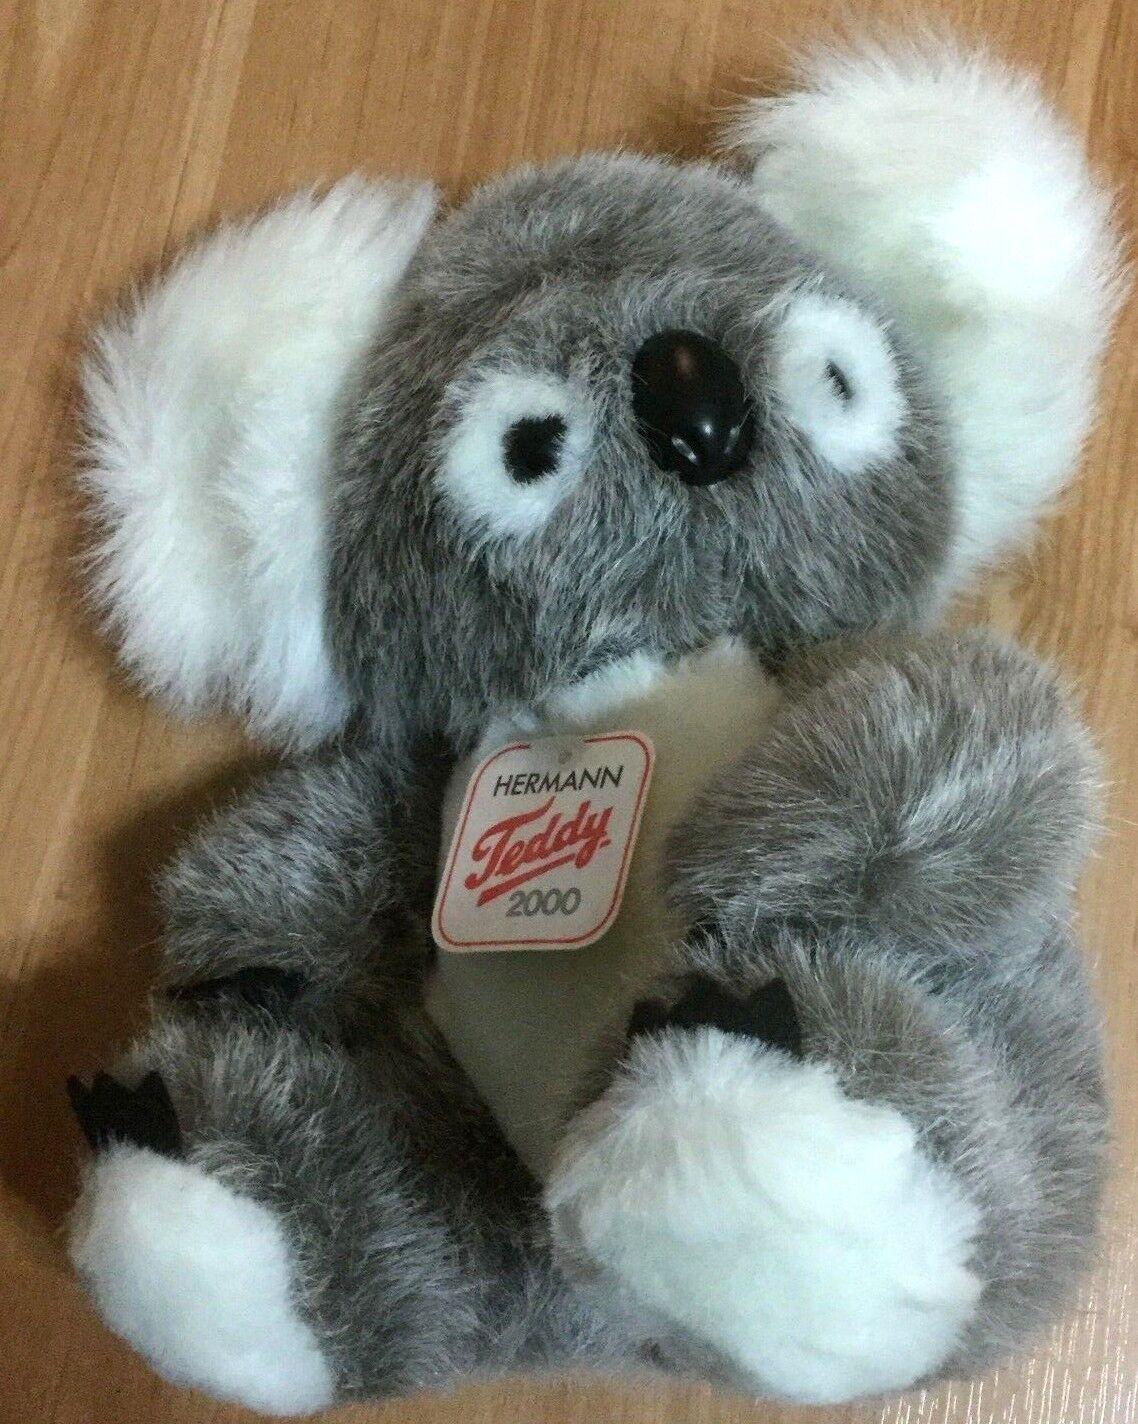 NWT Hermann Original Teddy Koala Bear Woven Fur Plush Teddy New  w Tags 10  26cm